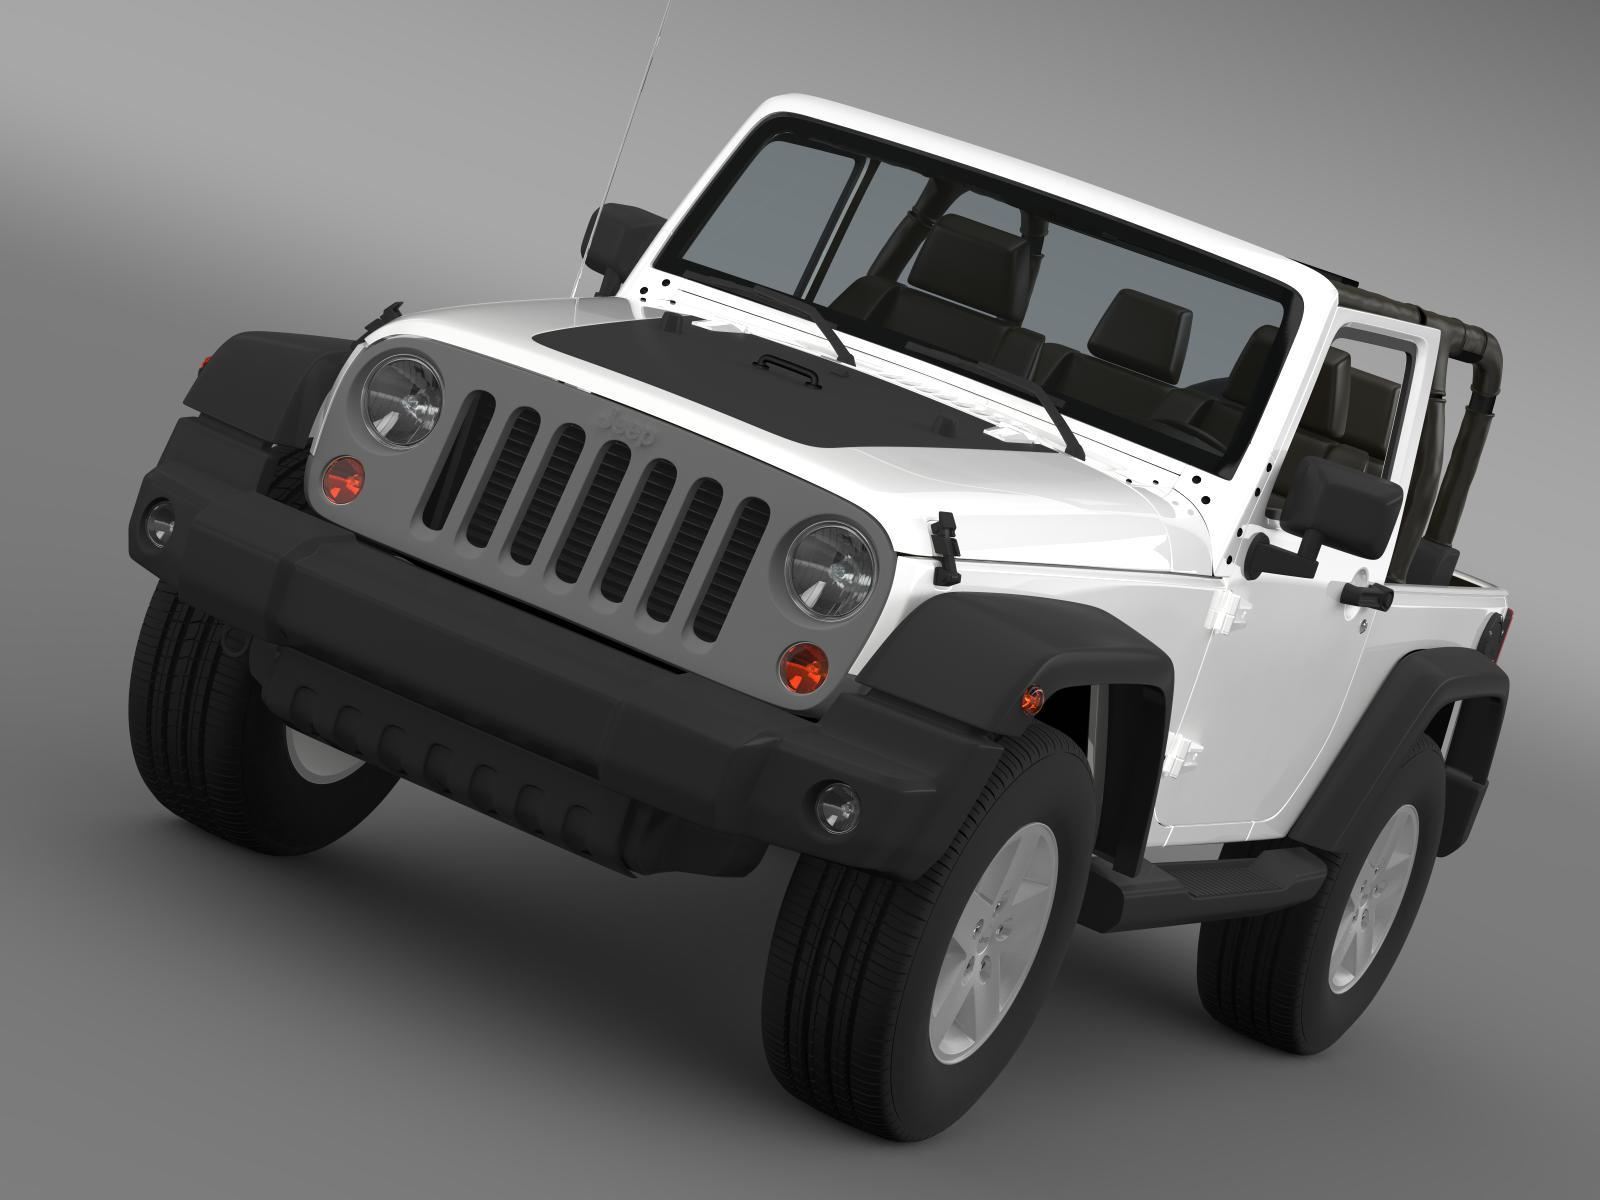 jeep wrangler mountain 2012 3d model 3ds max fbx c4d lwo ma mb hrc xsi obj 162498